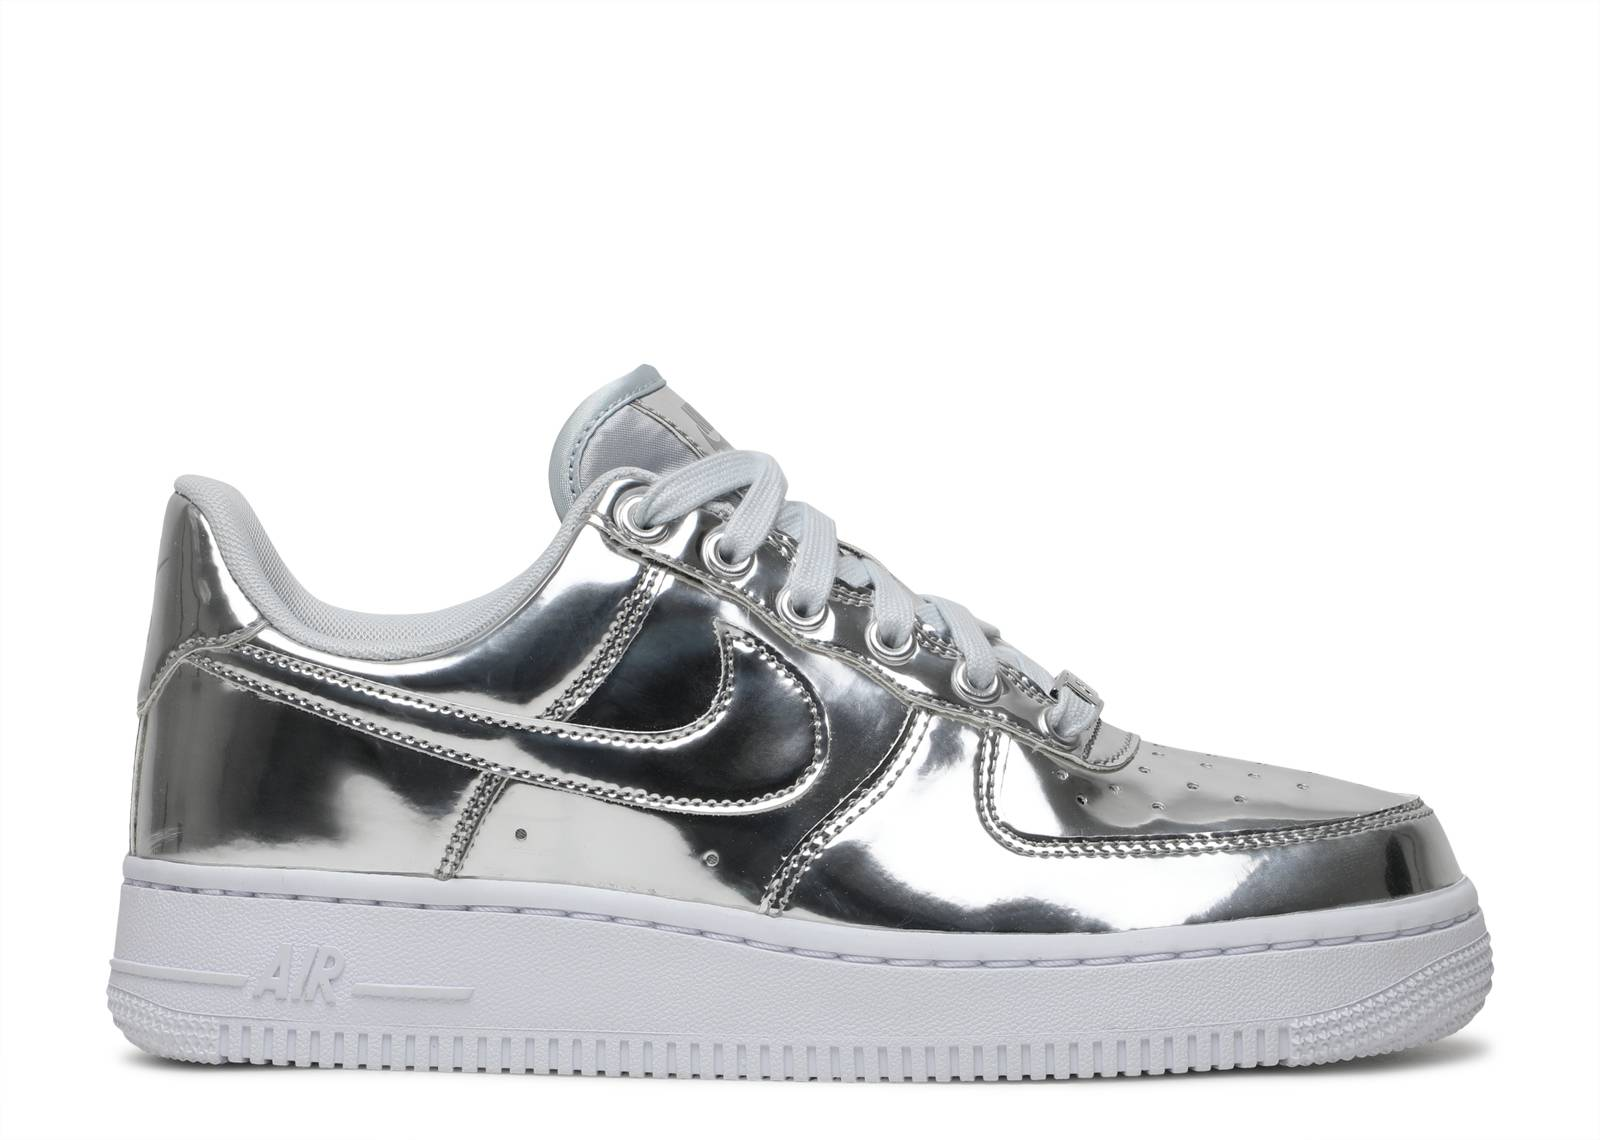 Nike Womens Air Force 1 CHROMEWHITE METALLIC SILVER